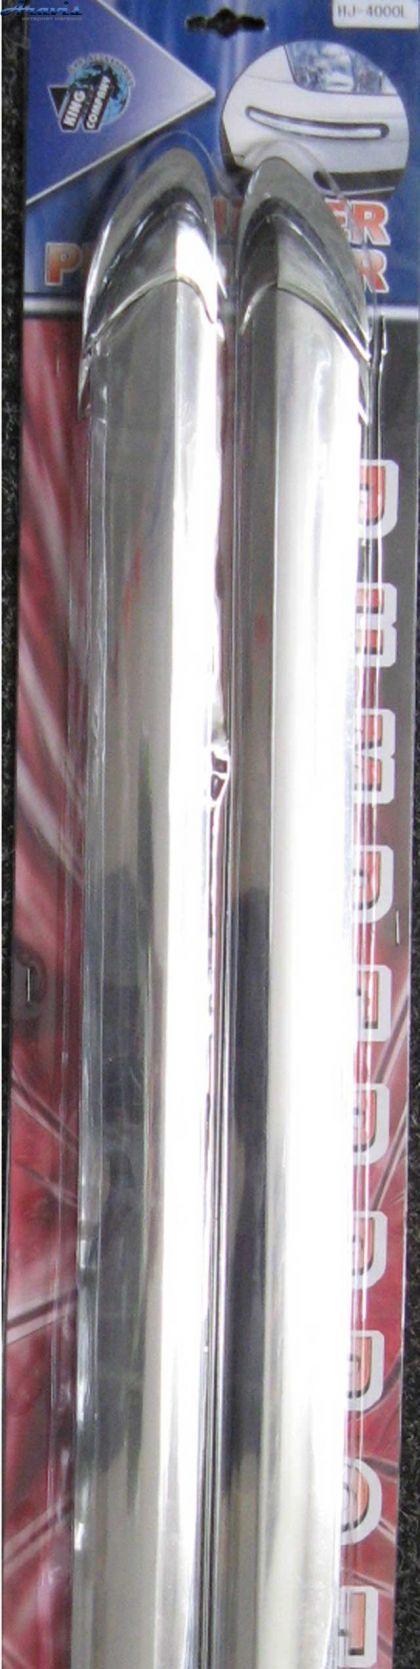 Накладки на бампер HJ-4000 L 420 х 45